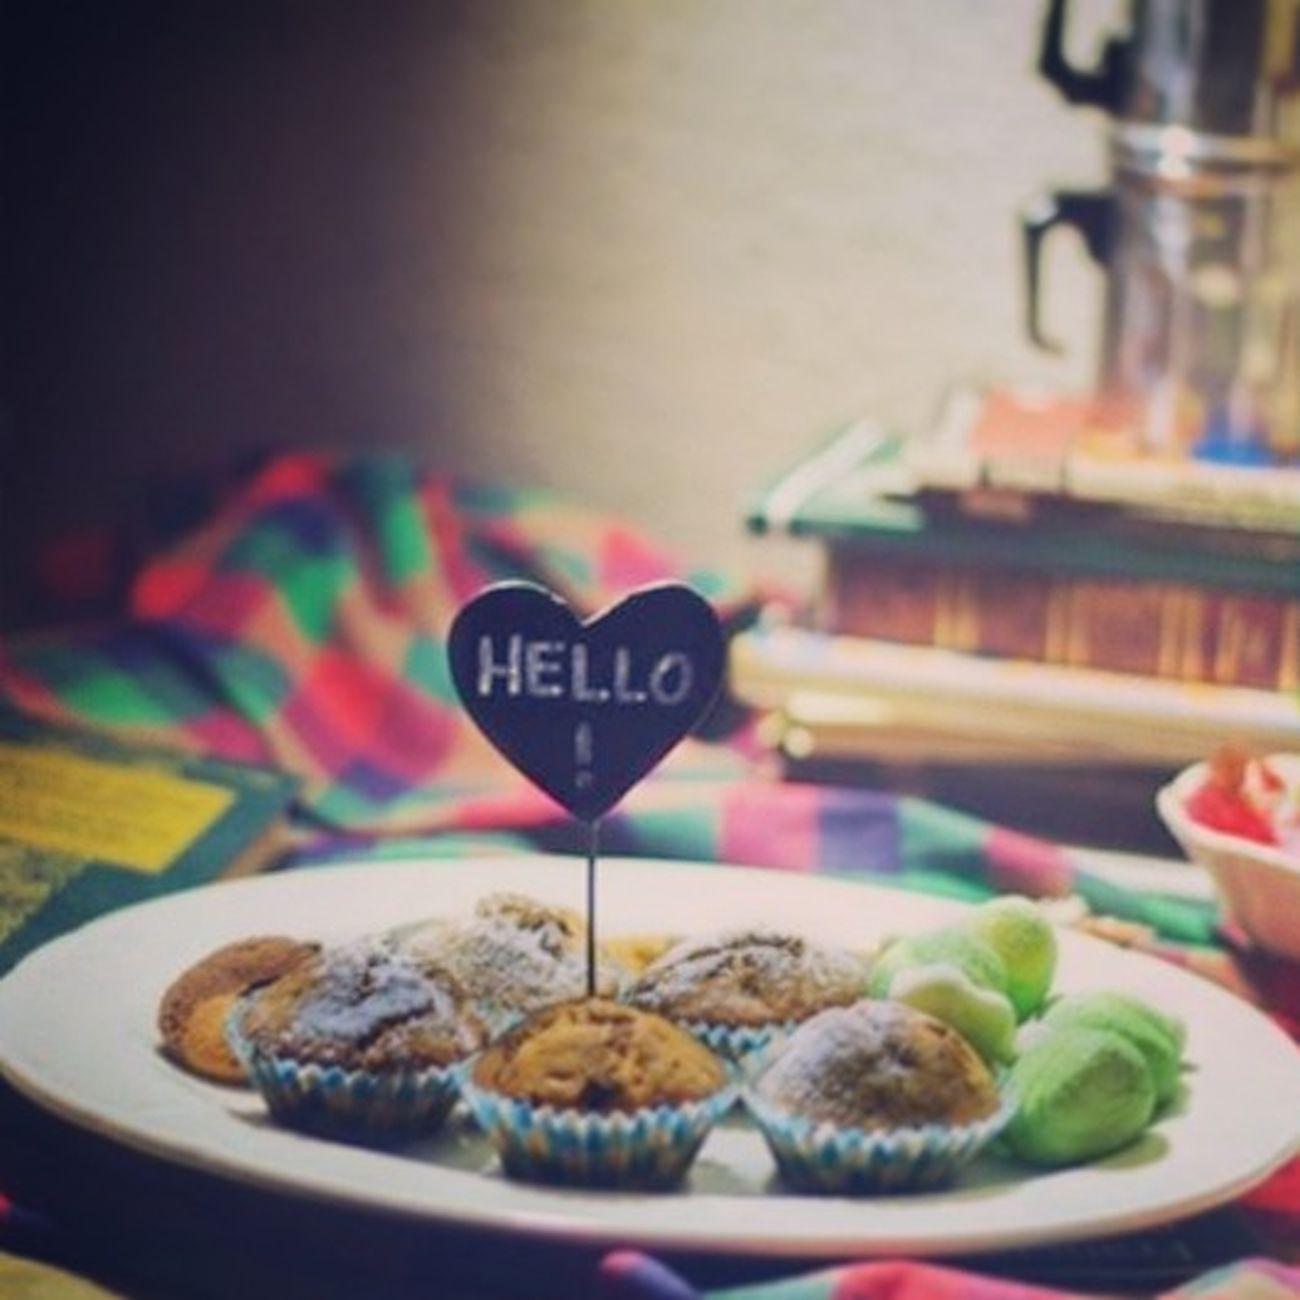 my portfolio: www.mafaldadesimone.it Photography Cupcakes Hello World